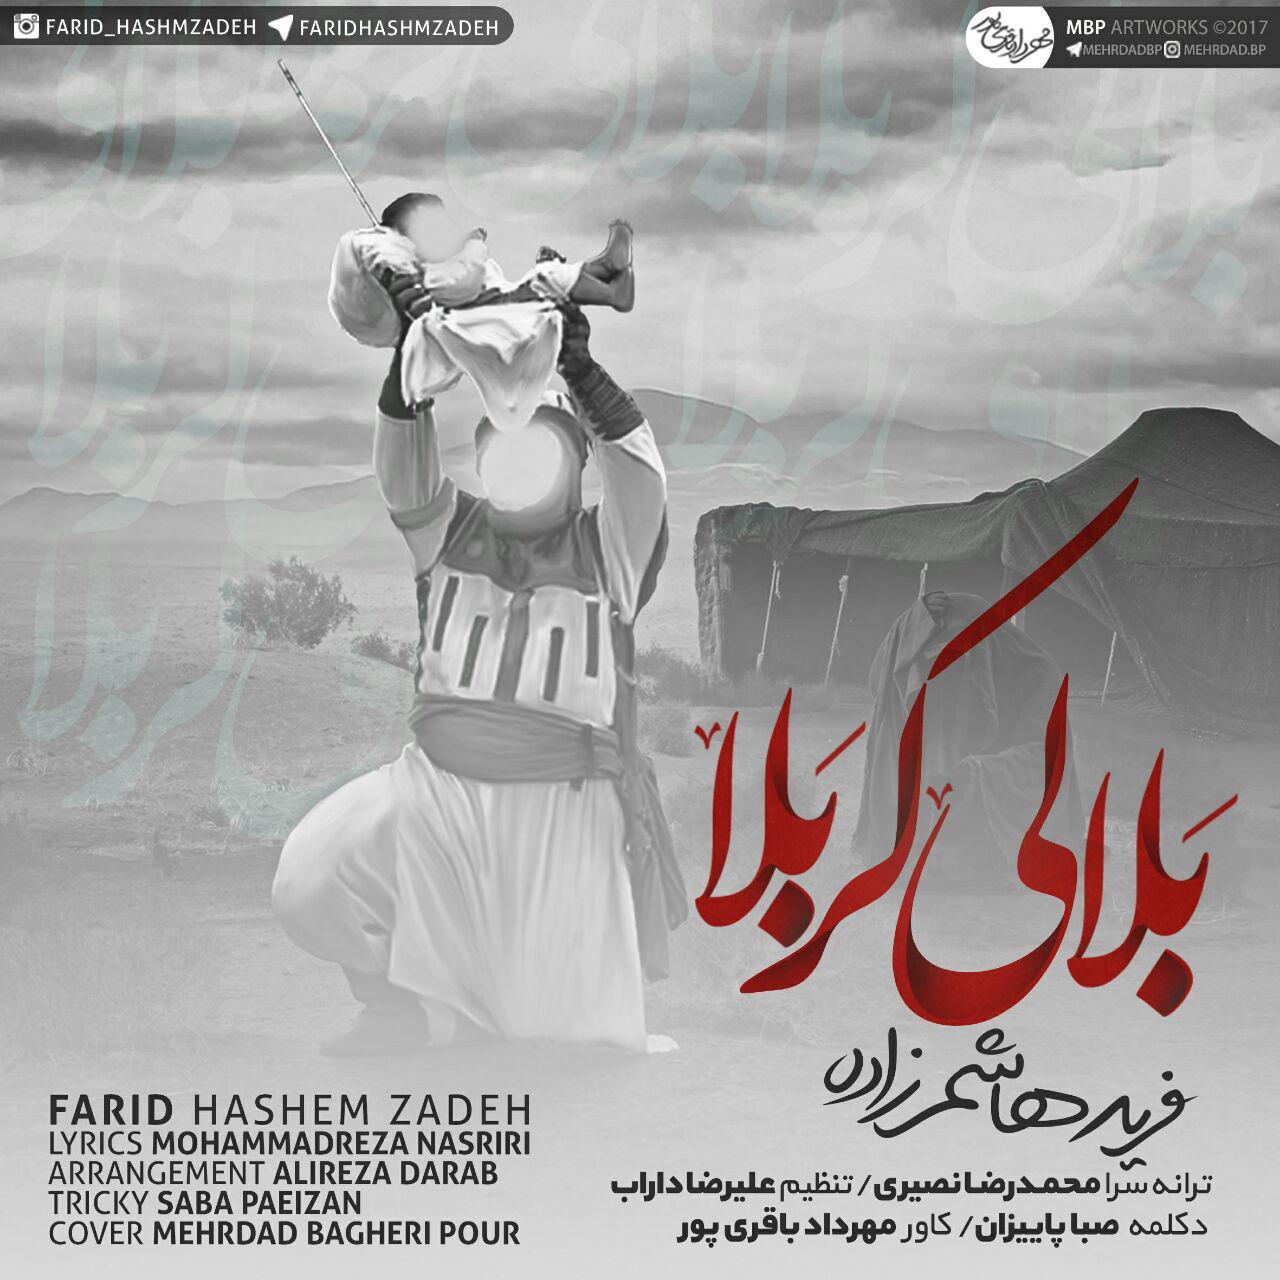 http://s9.picofile.com/file/8311566076/04Farid_Hashemzadeh_Balali_Karbala.jpg